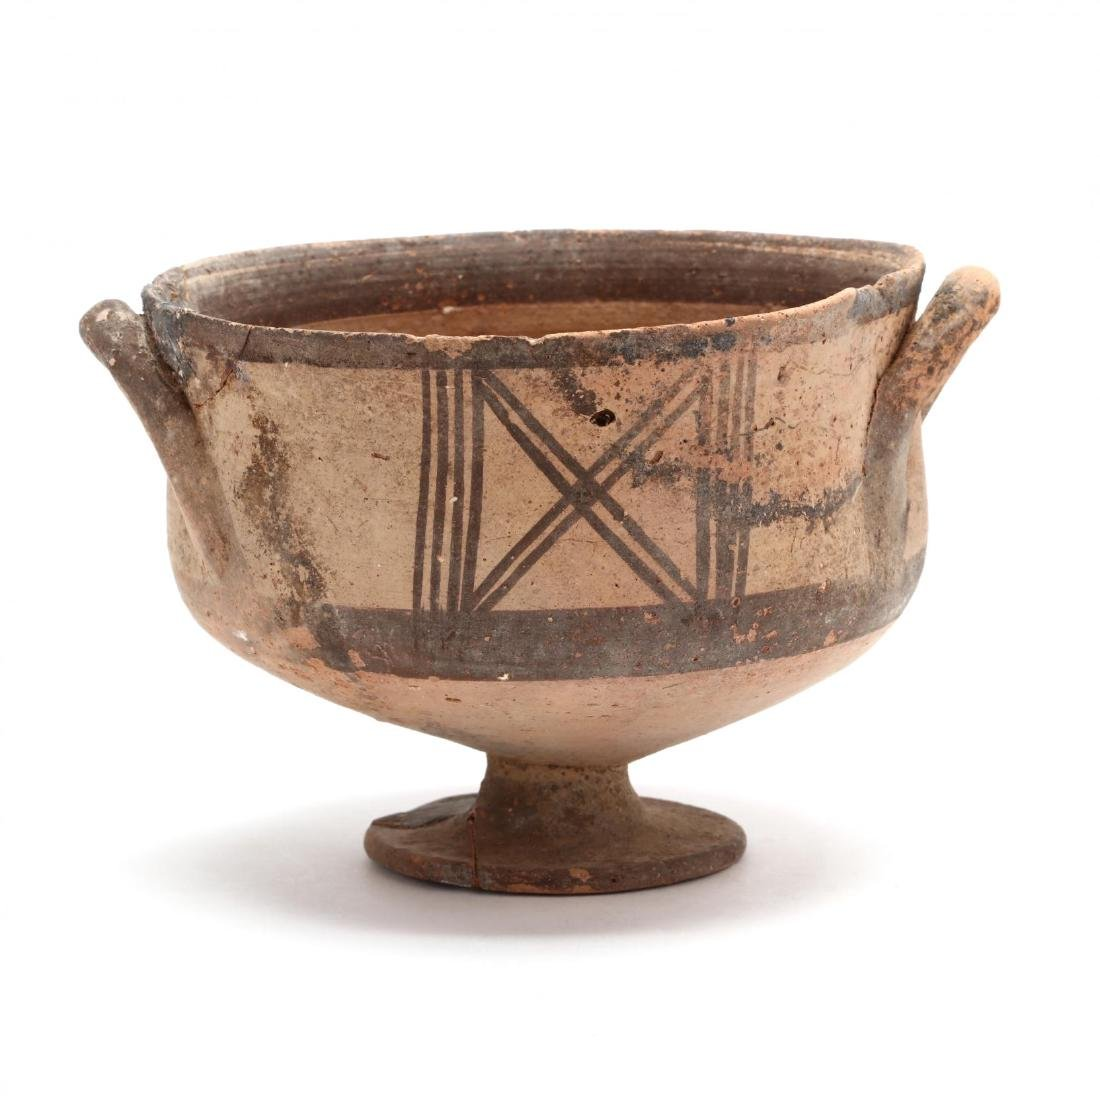 Cypro-Geometric Creme Ware Stemmed Bowl